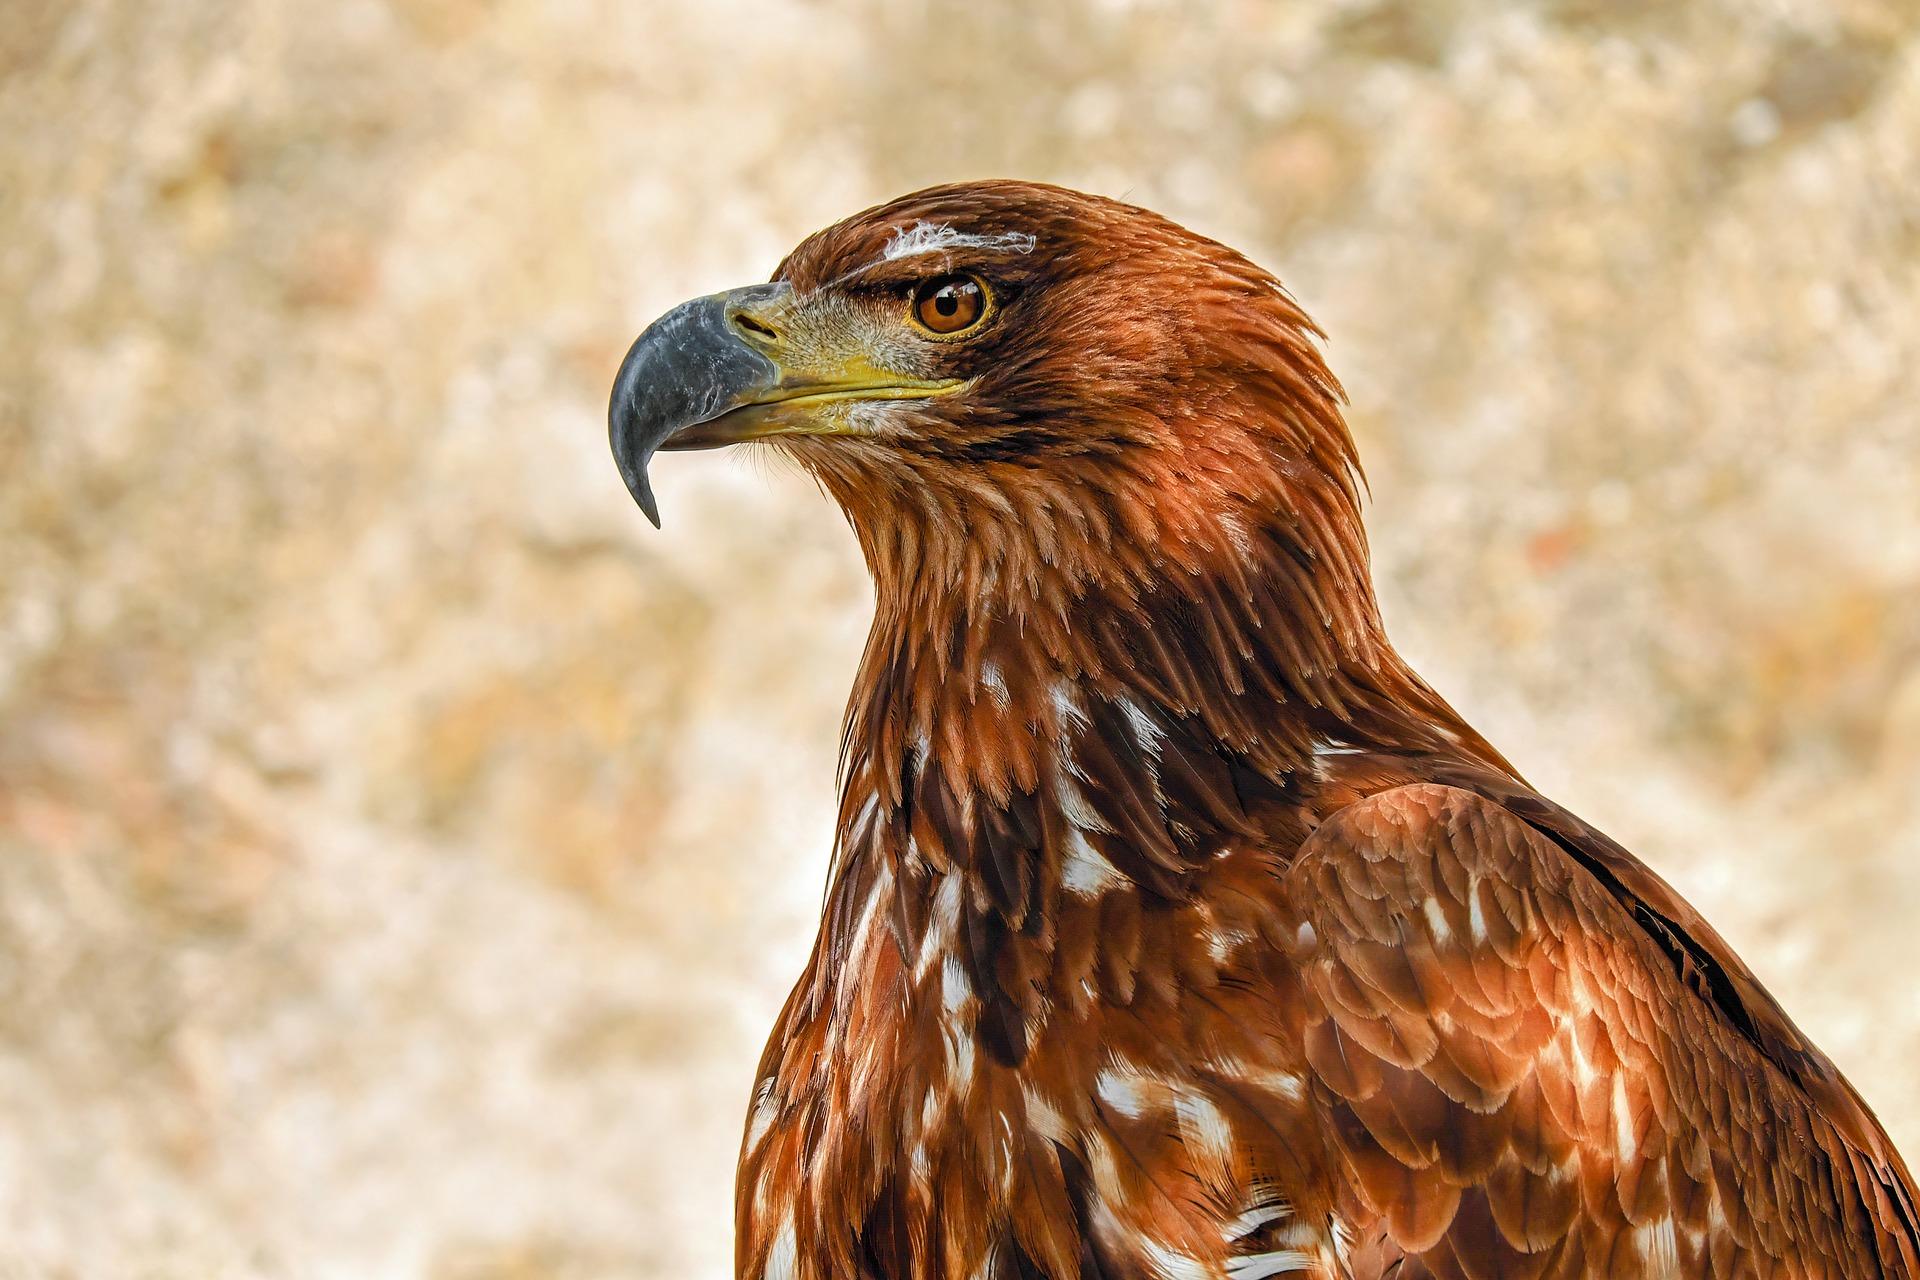 of-prey-eagle-Fatherheart France